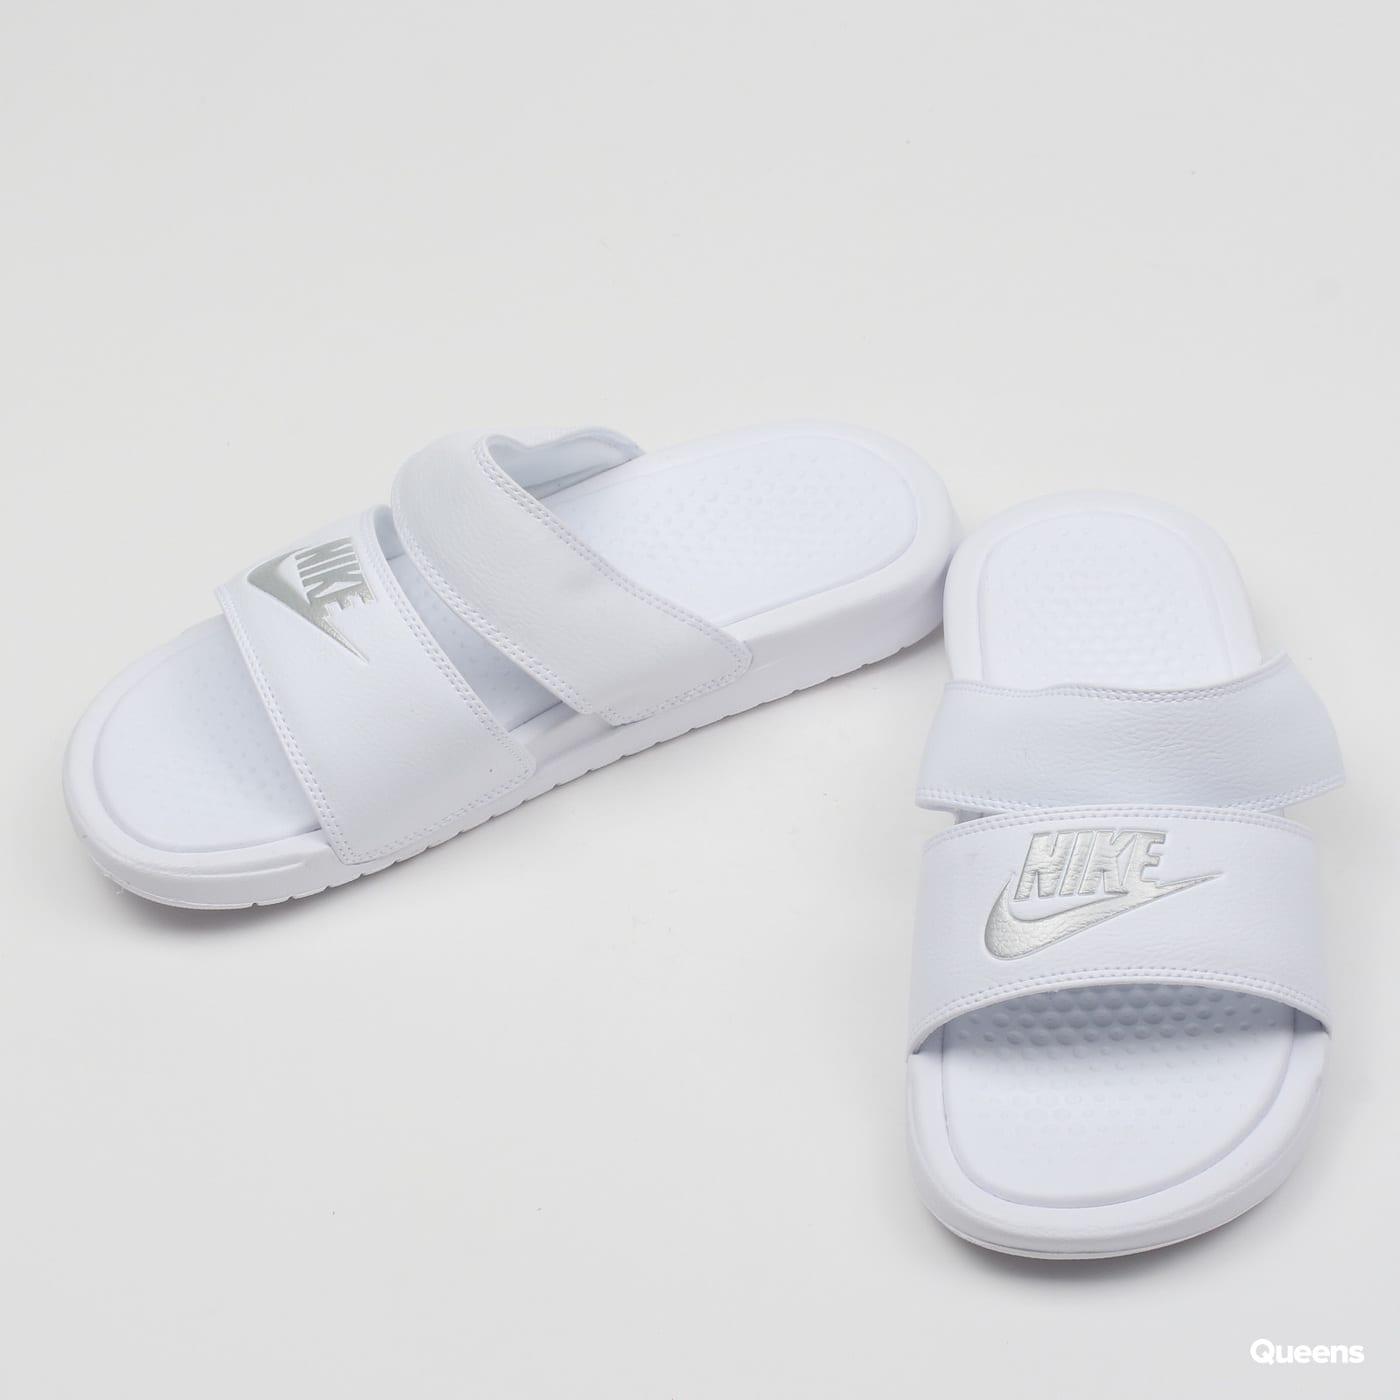 separation shoes 549f0 0f68e ZvětšitZvětšitZvětšitZvětšitZvětšit. Nike WMNS Benasi Duo Ultra Slide ...